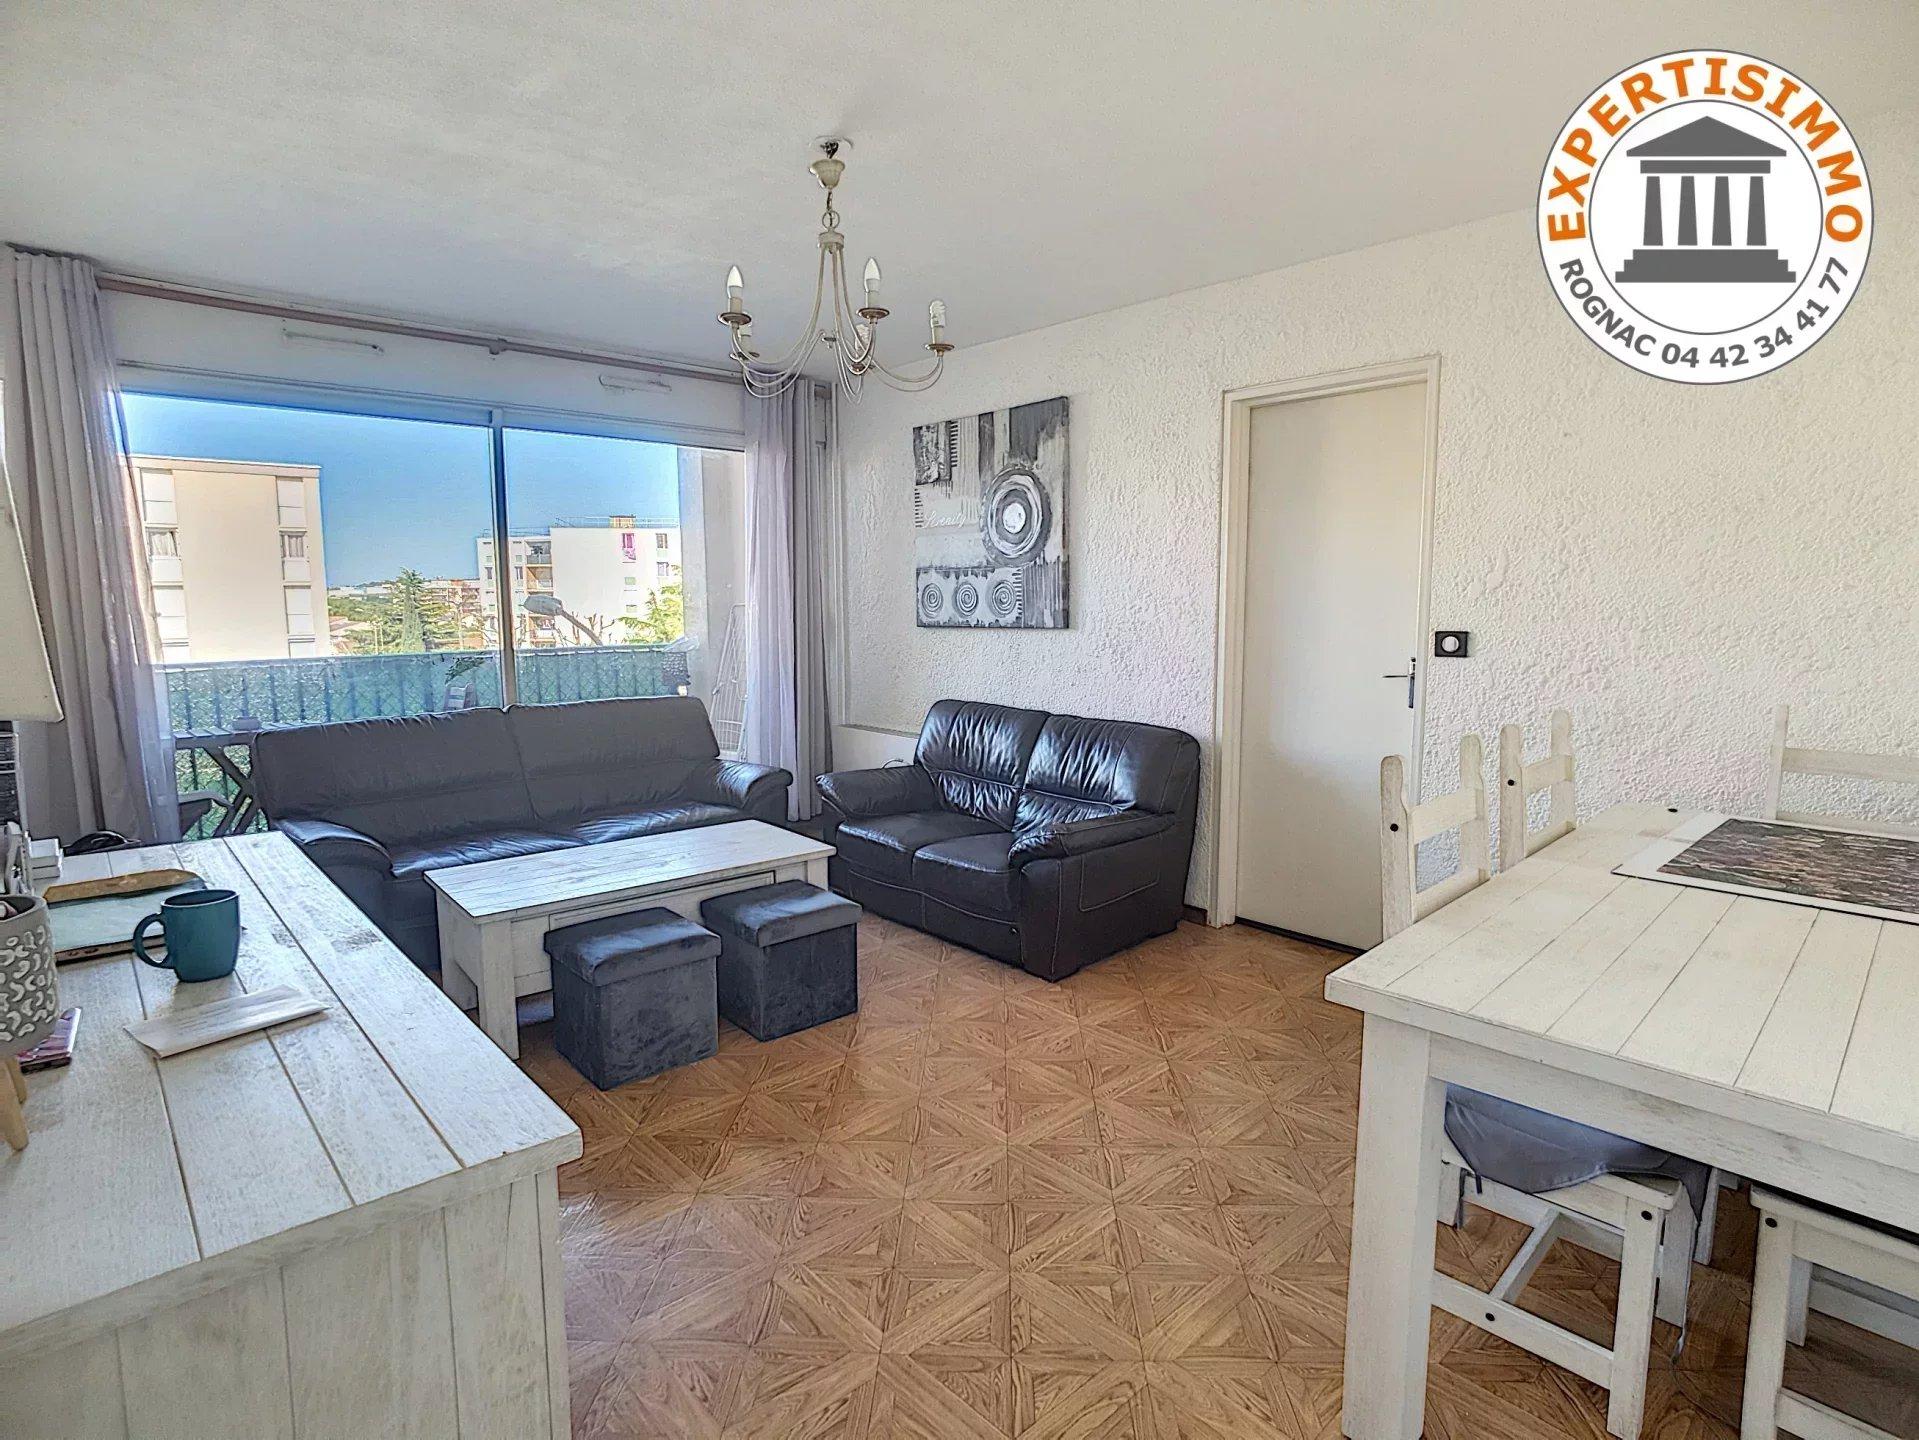 Appartement T4 Rognac